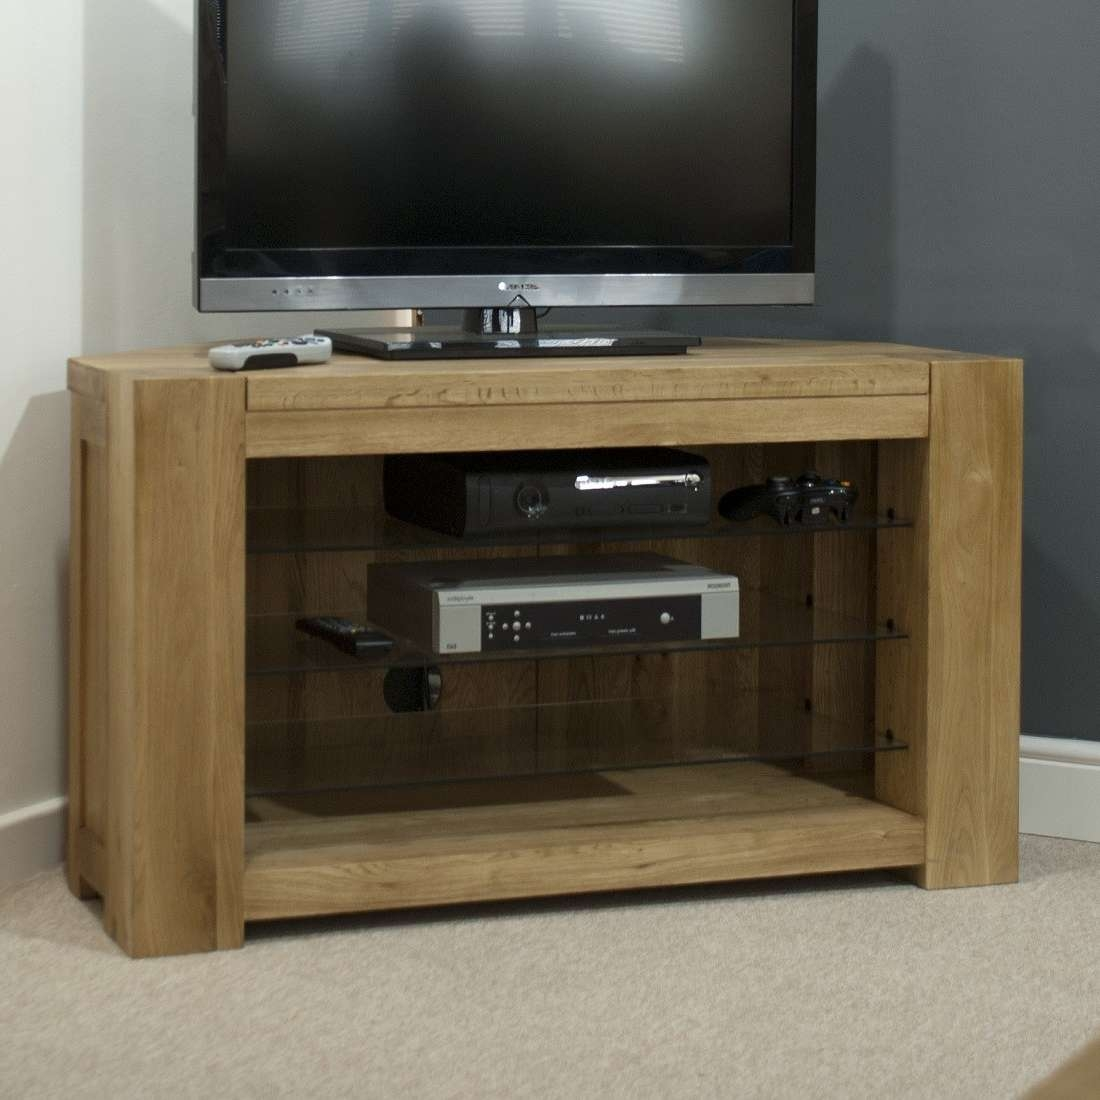 Trend Solid Oak Corner Tv Unit | Oak Furniture Uk Throughout Real Wood Corner Tv Stands (View 10 of 15)